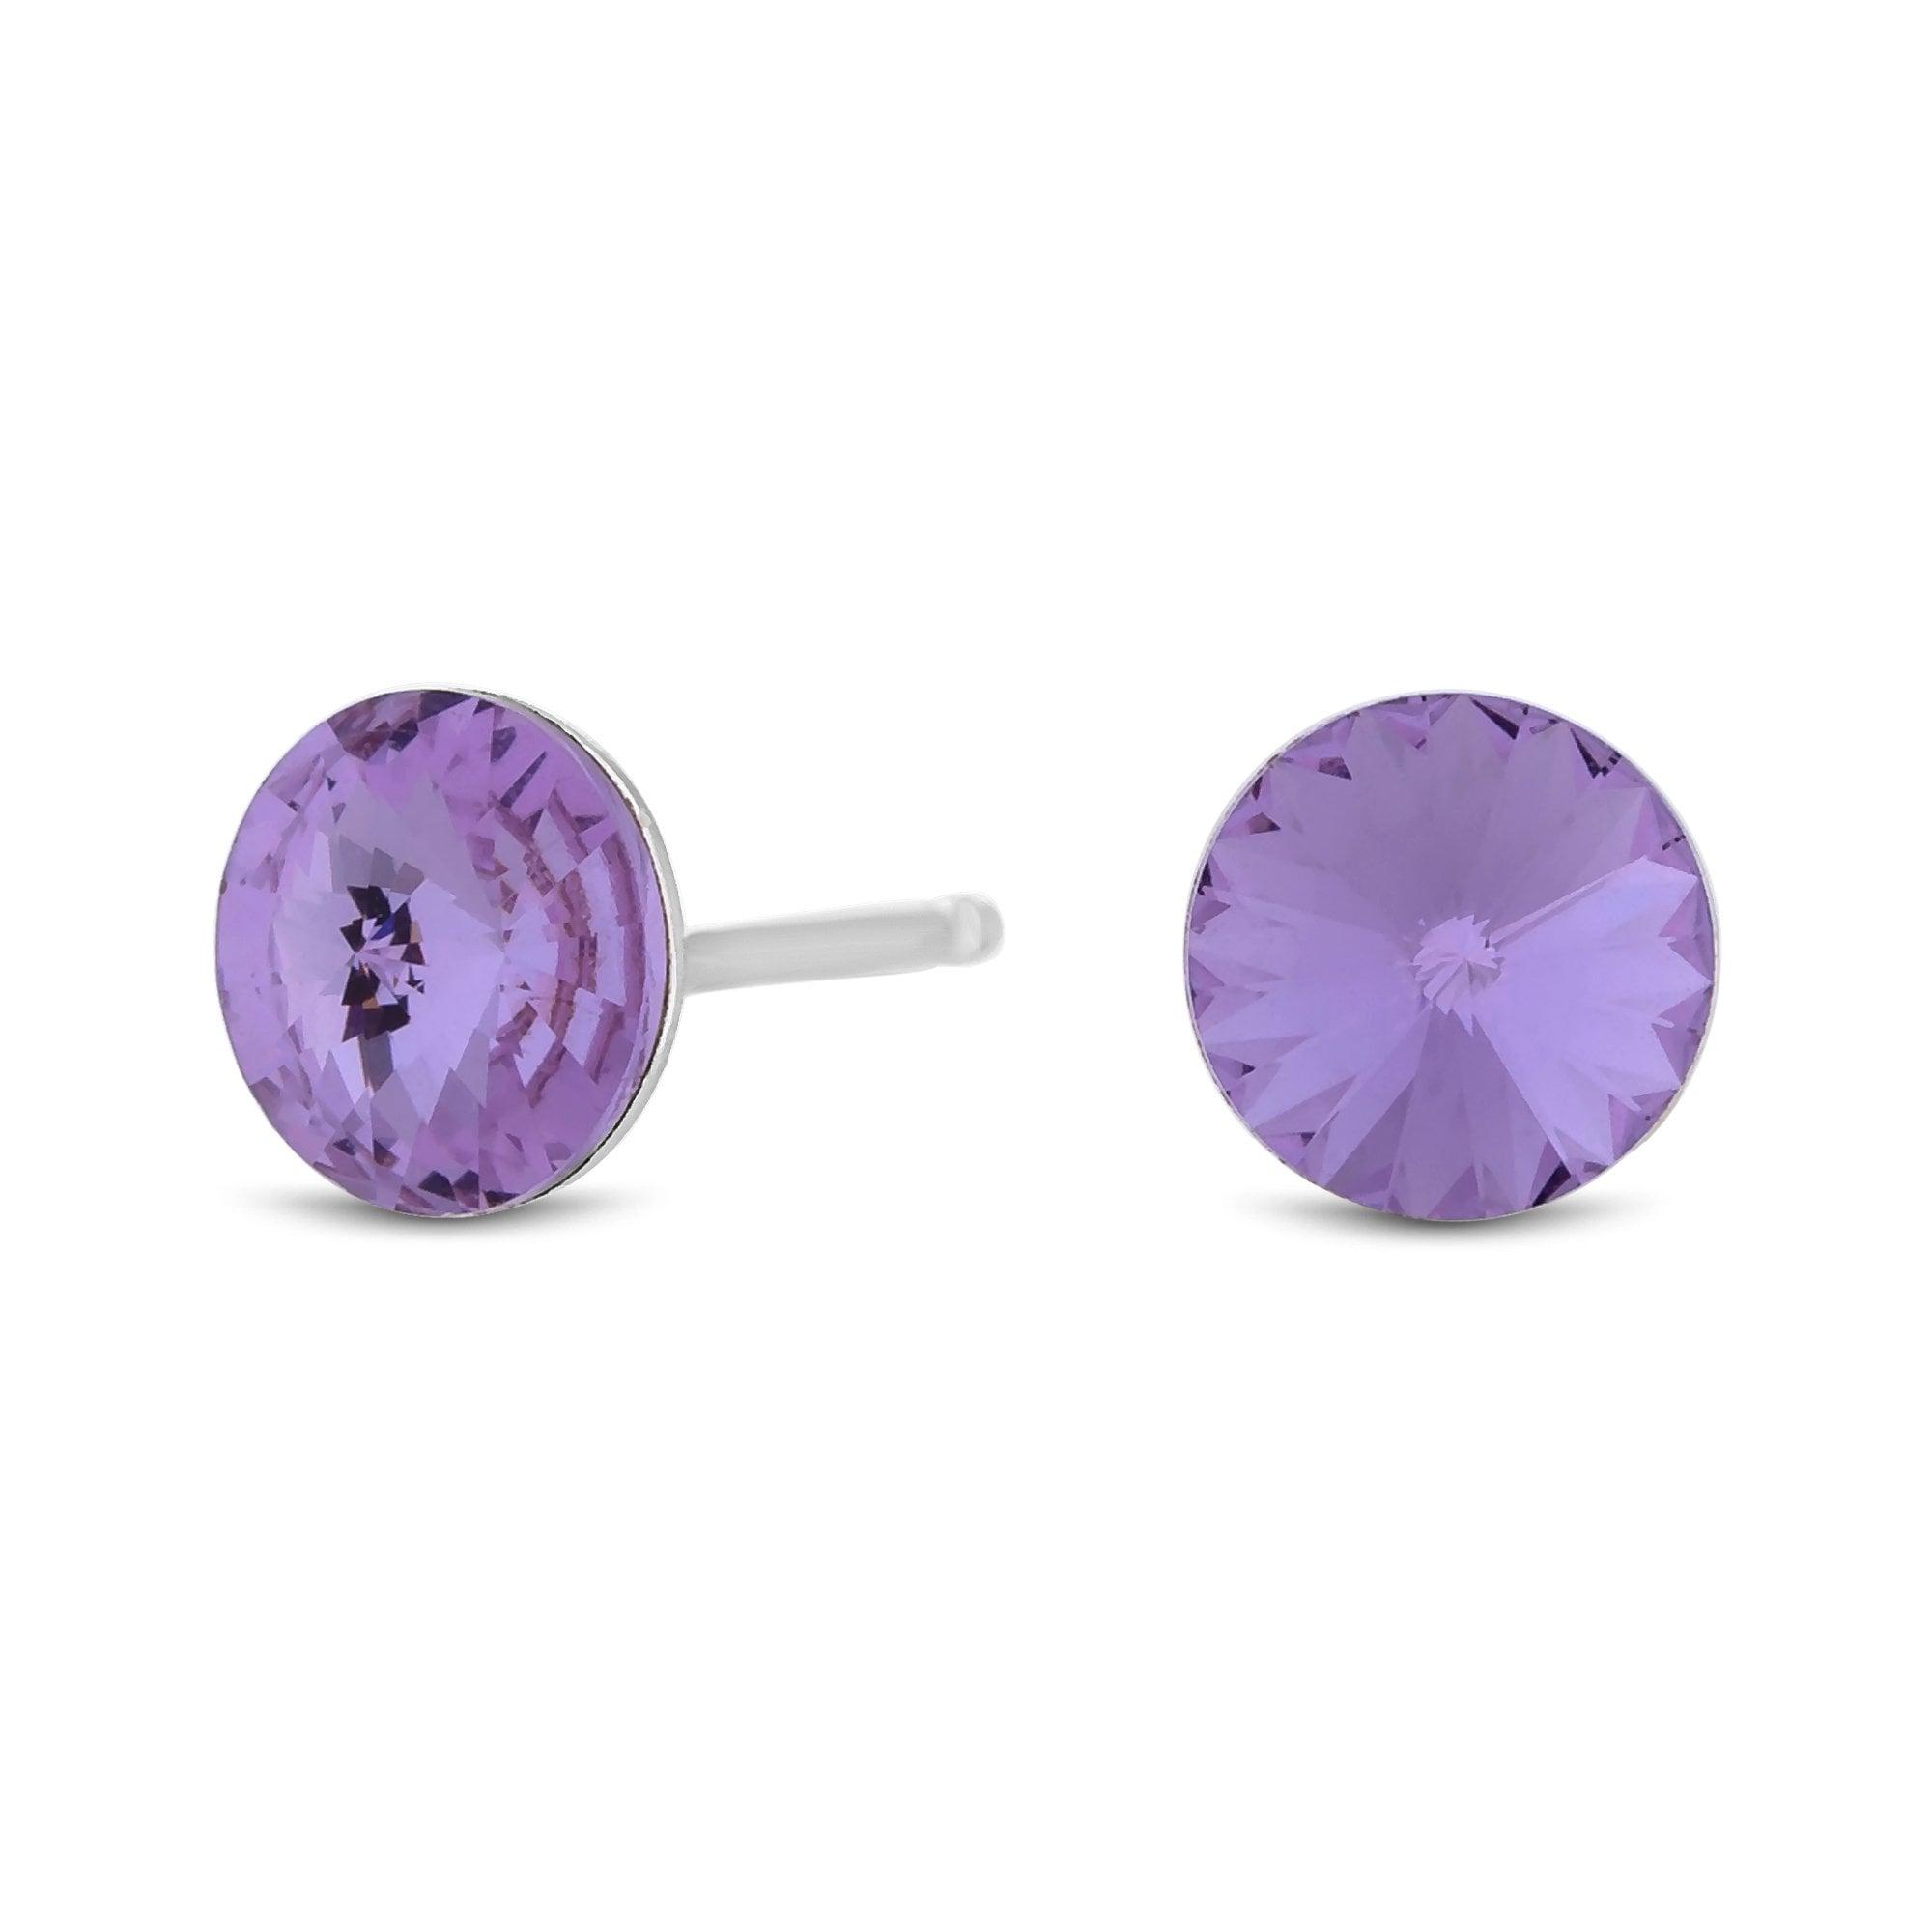 Sterling Silver 925 Purple Stud Earring Embellished With Swarovski Crystals